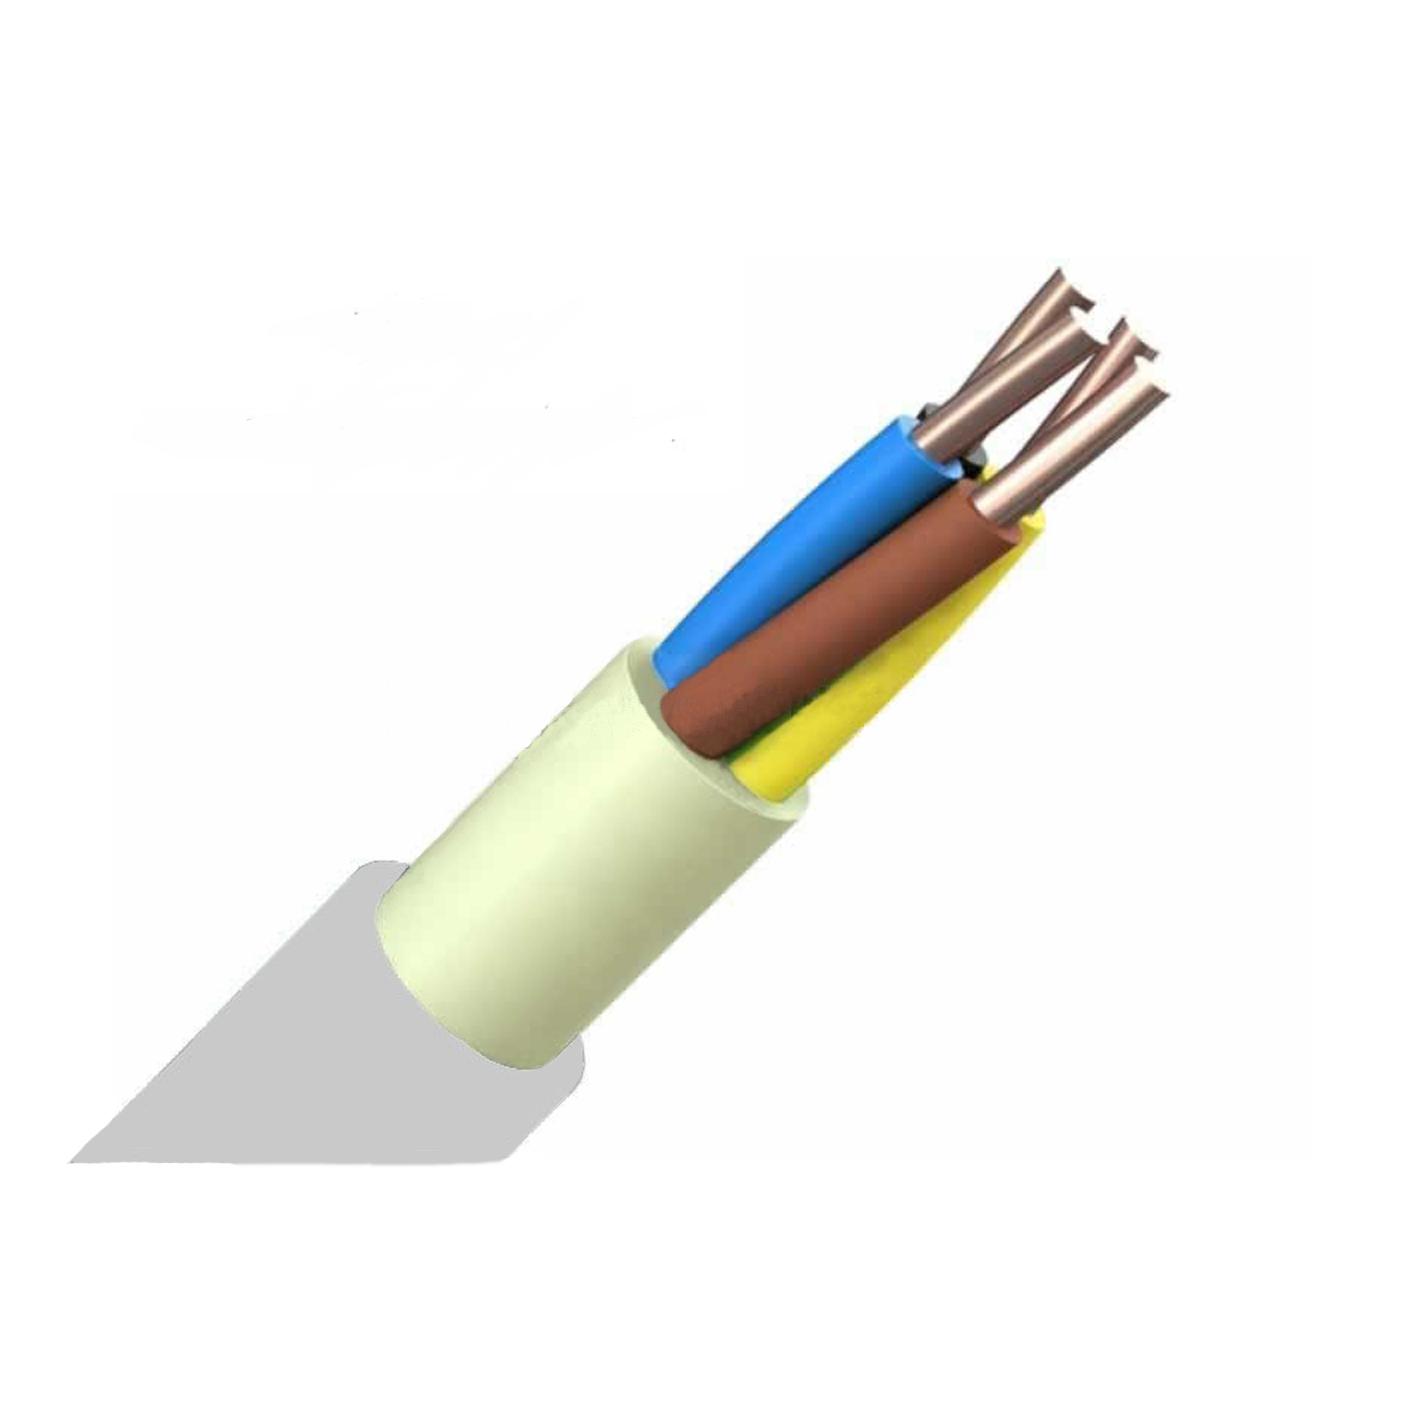 Öznur 2x1.5 NYM (NVV) Kablo